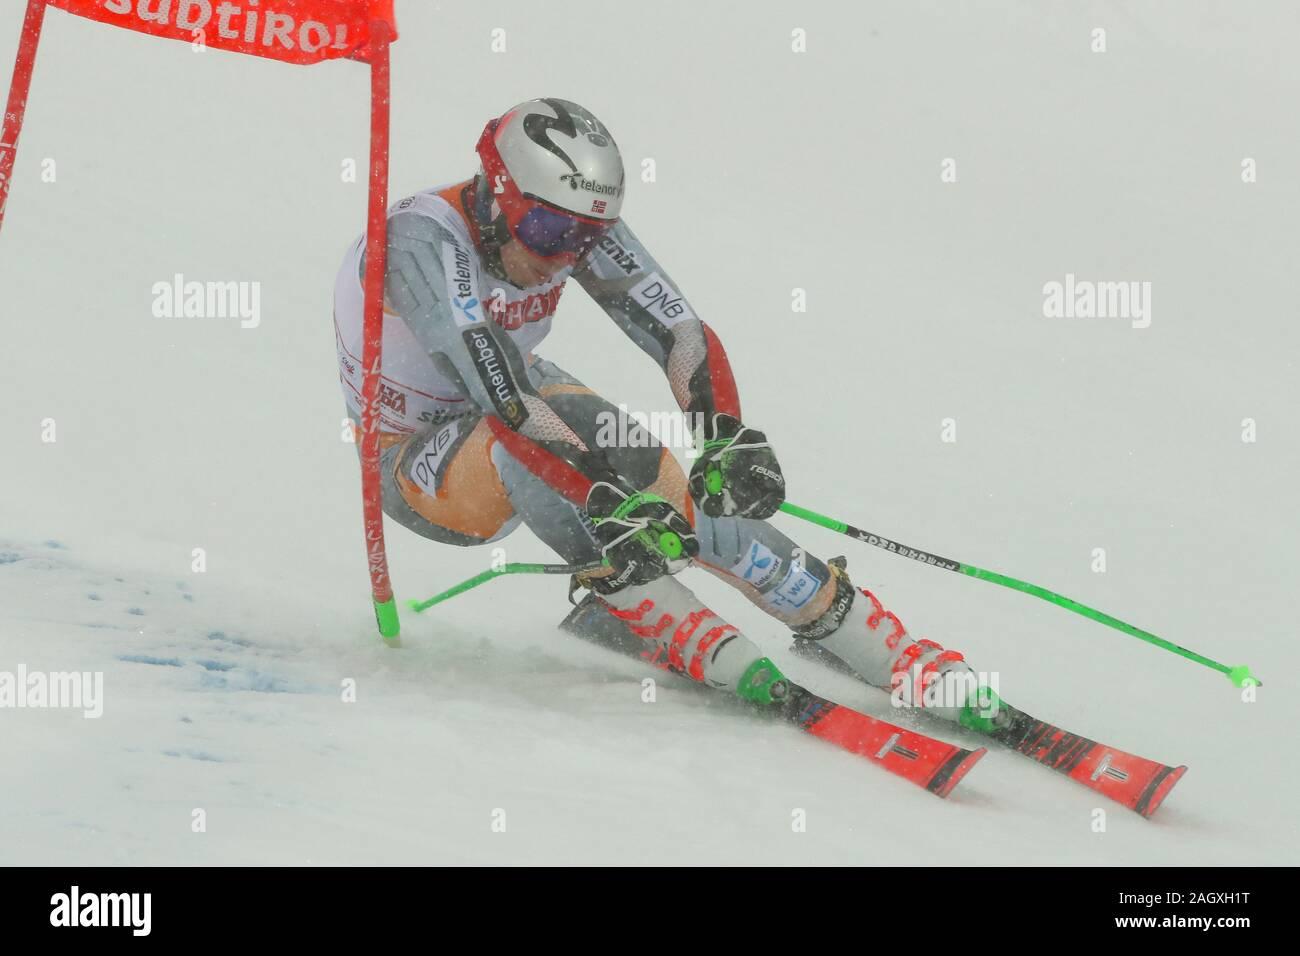 Alta Badia, Italy. 22nd Dec, 2019. kristoffersen henrik (nor) first classifiedduring FIS SKI WORLD CUP 2019 - Giant Slalom Men, Ski in Alta Badia, Italy, December 22 2019 - LPS/Sergio Bisi Credit: Sergio Bisi/LPS/ZUMA Wire/Alamy Live News Stock Photo